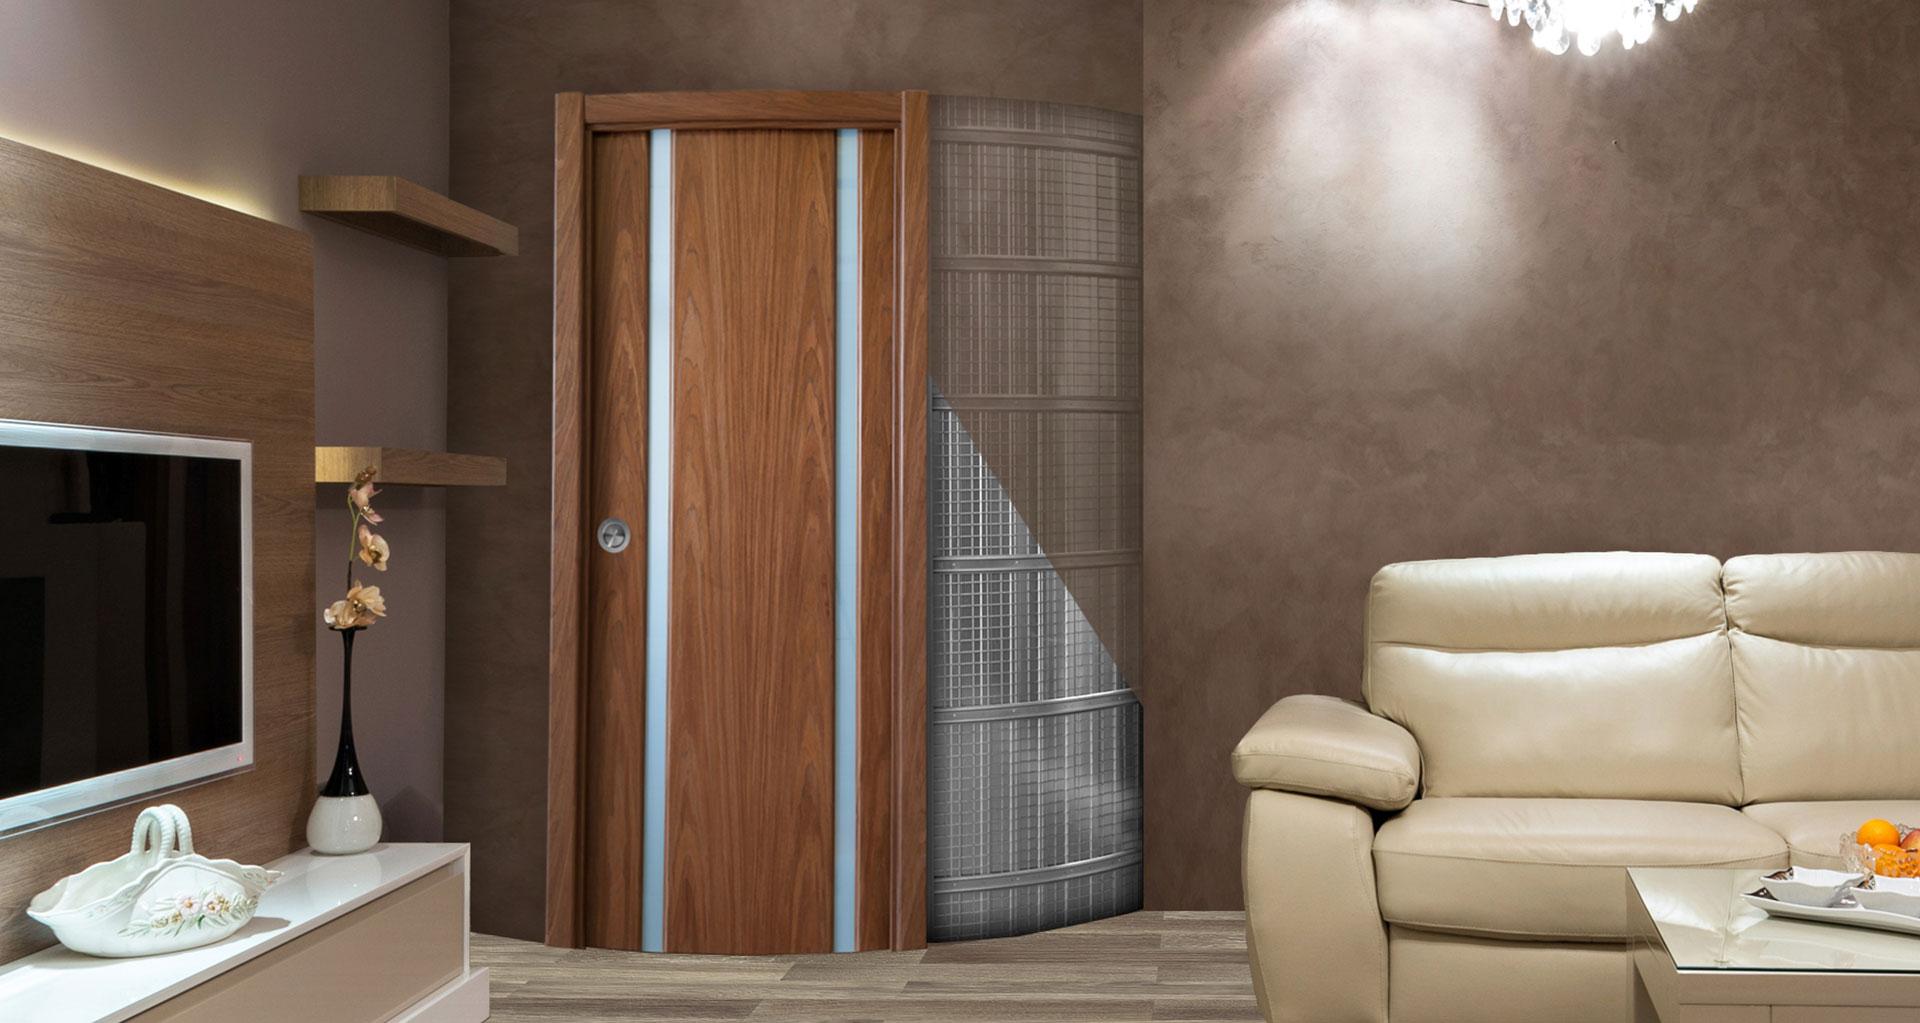 Archi in cartongesso per interni pareti in cartongesso - Archi in gesso per interni ...